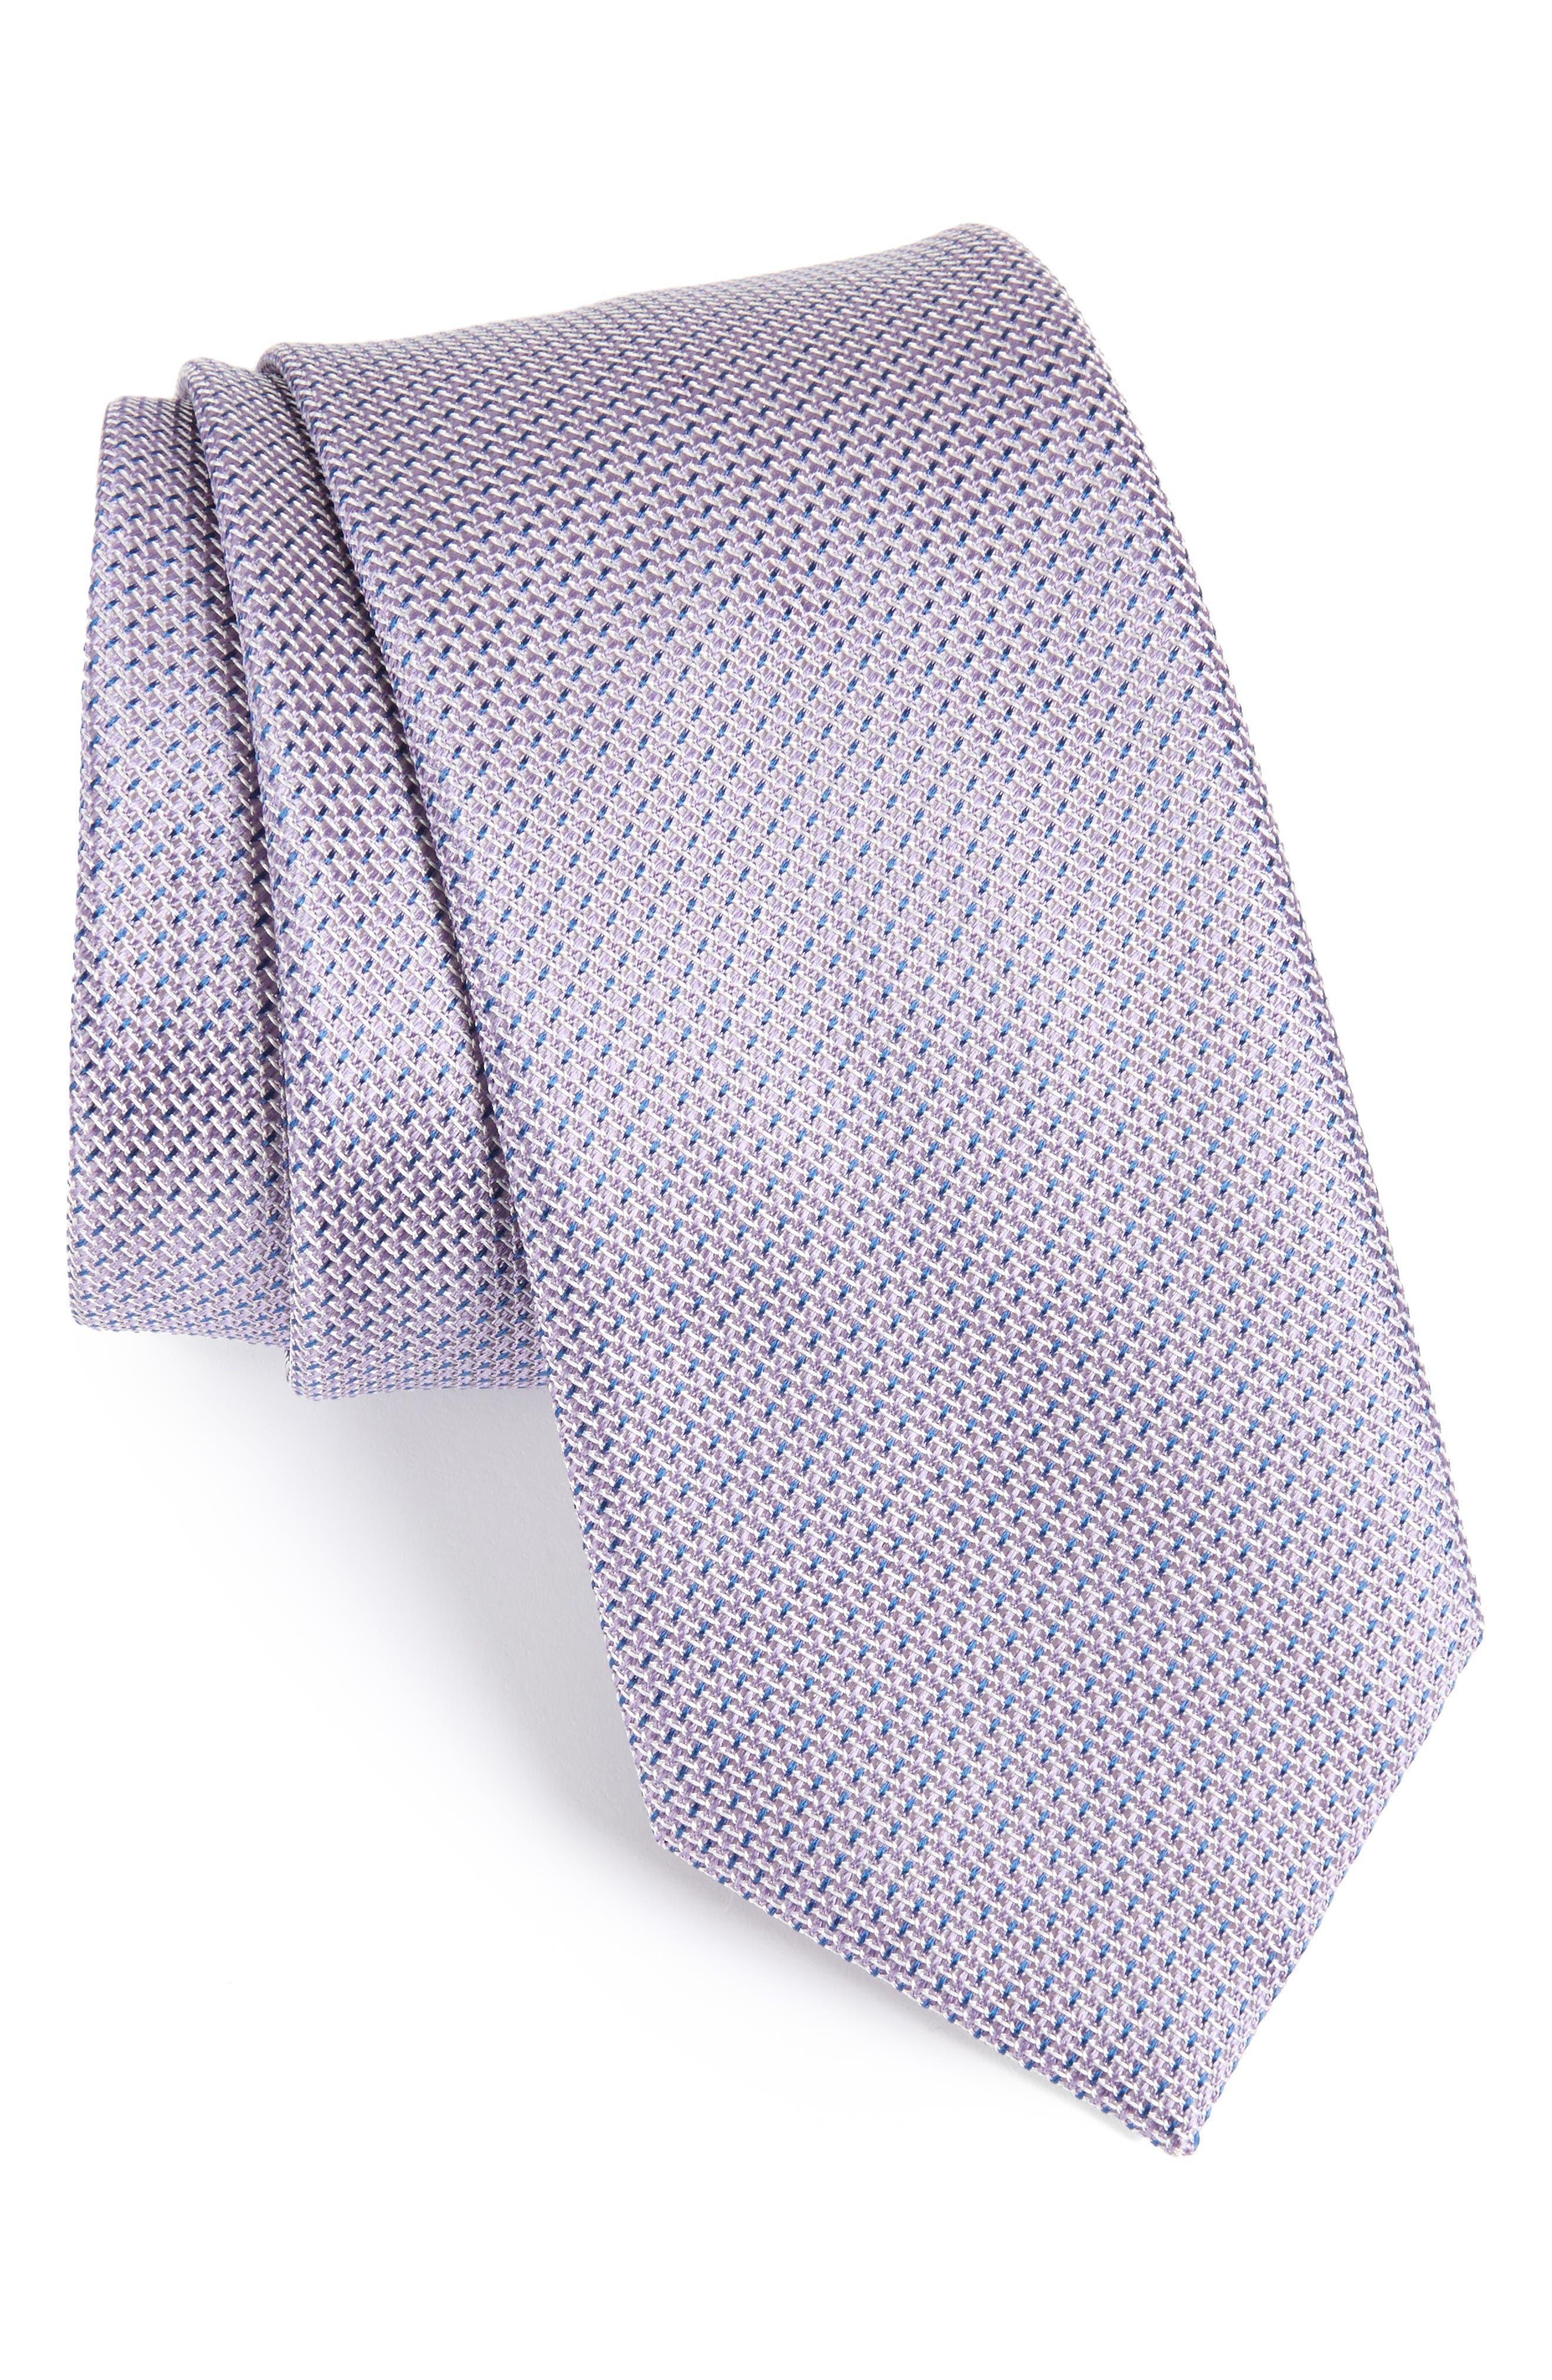 Geometric Silk Tie,                         Main,                         color, Lilac/ Blue